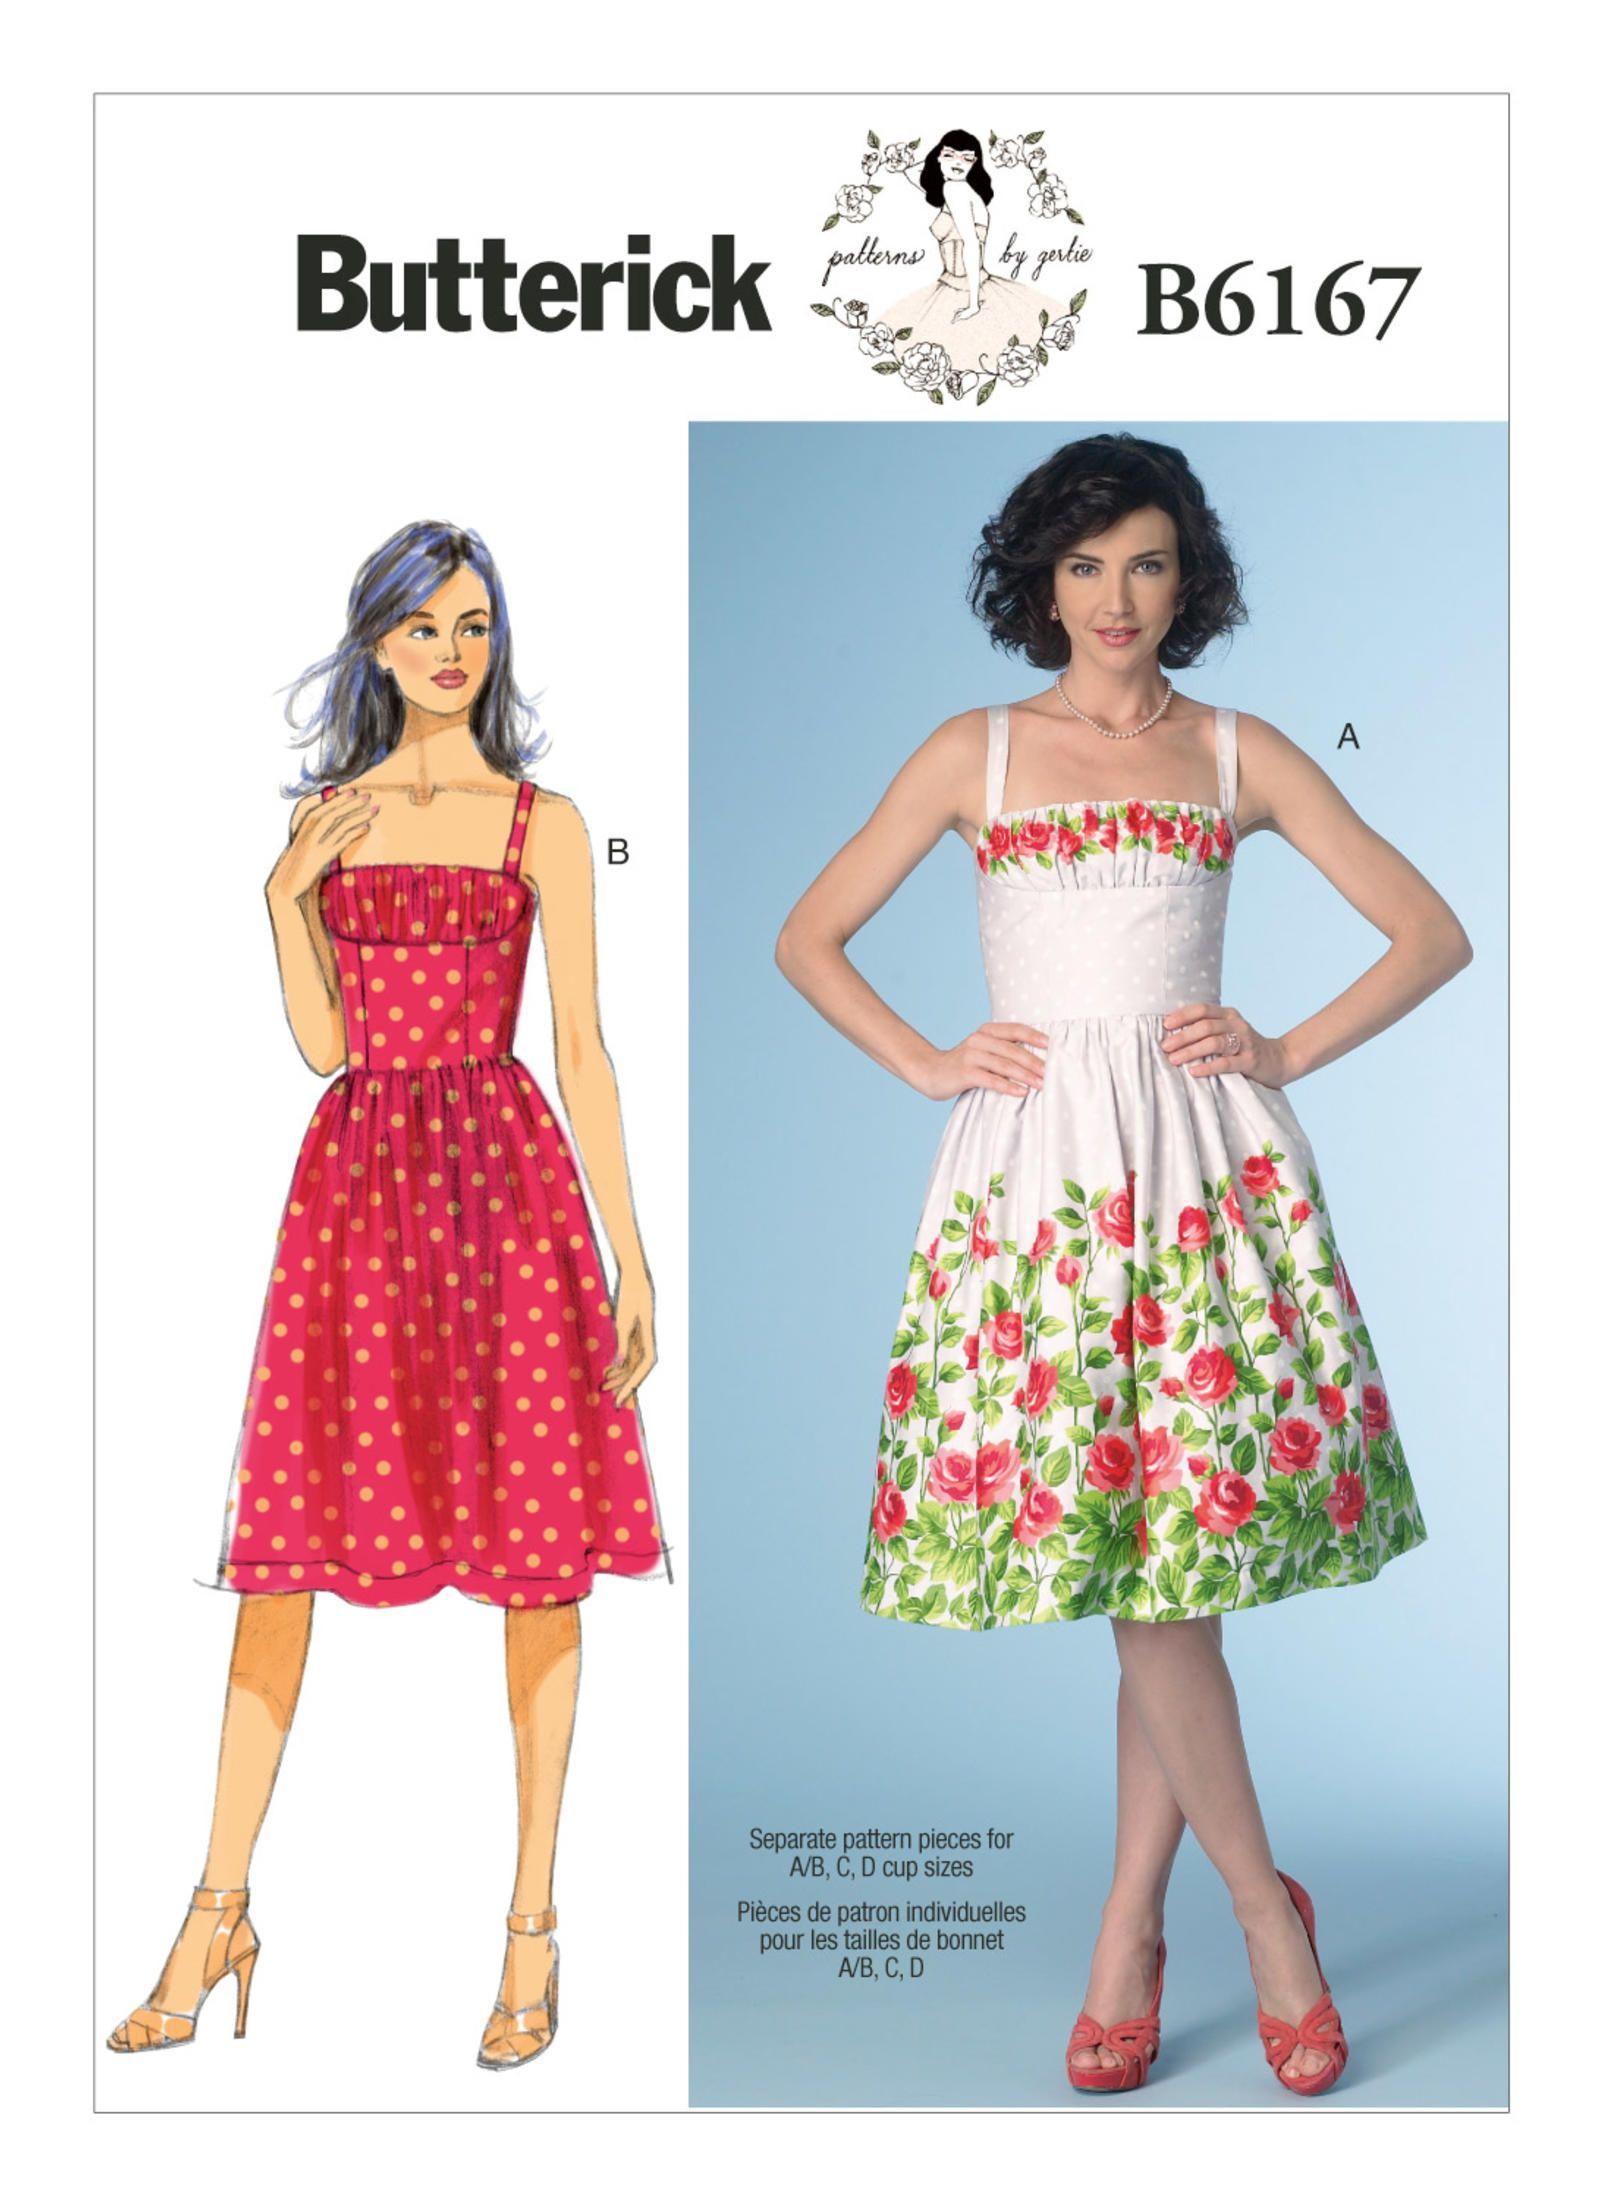 B6167 | Butterick Patterns | Imma do This Myself | Pinterest ...